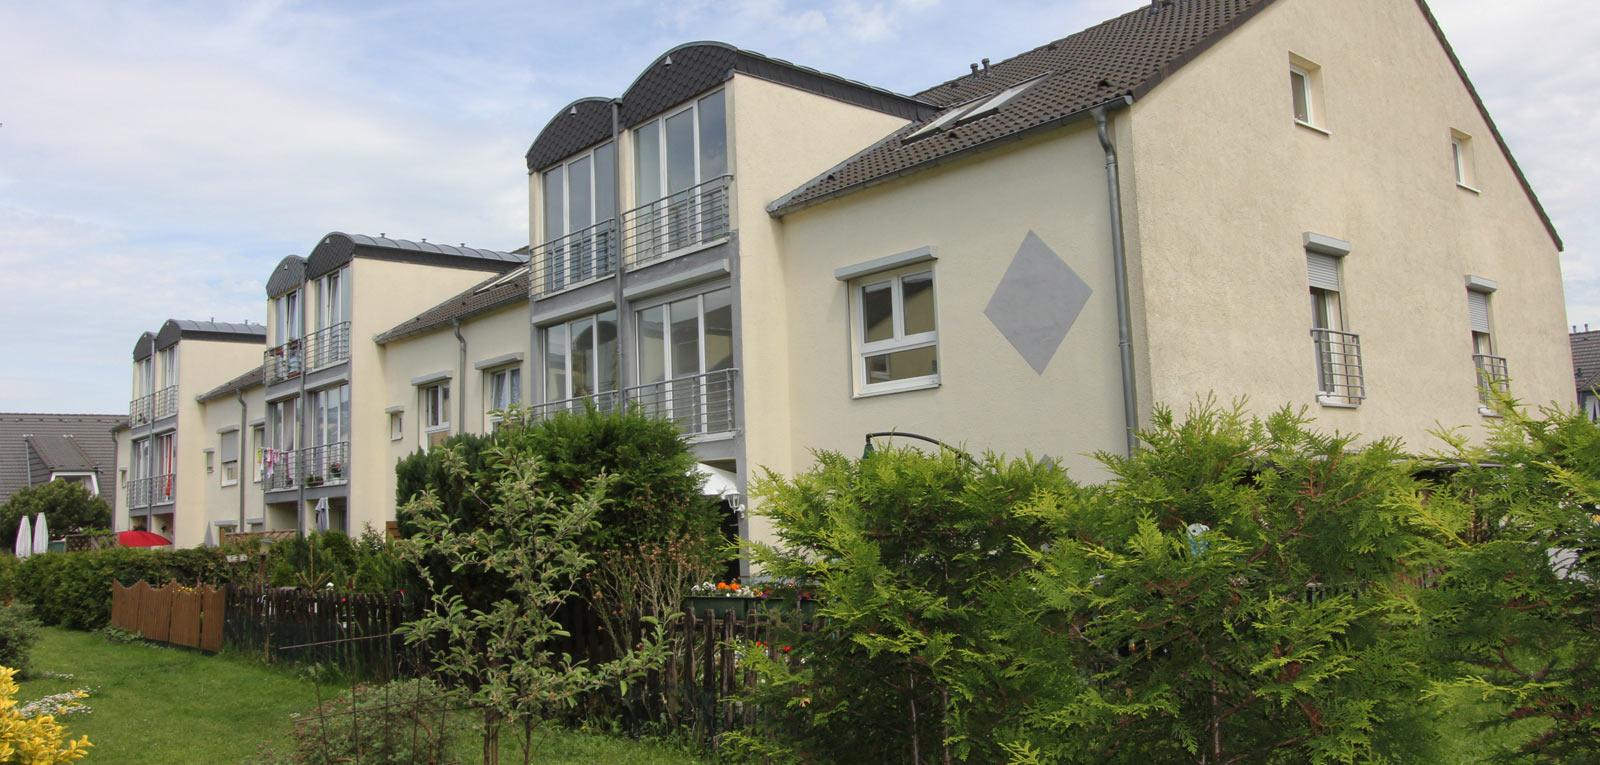 Immobilien-Verwaltung Gera